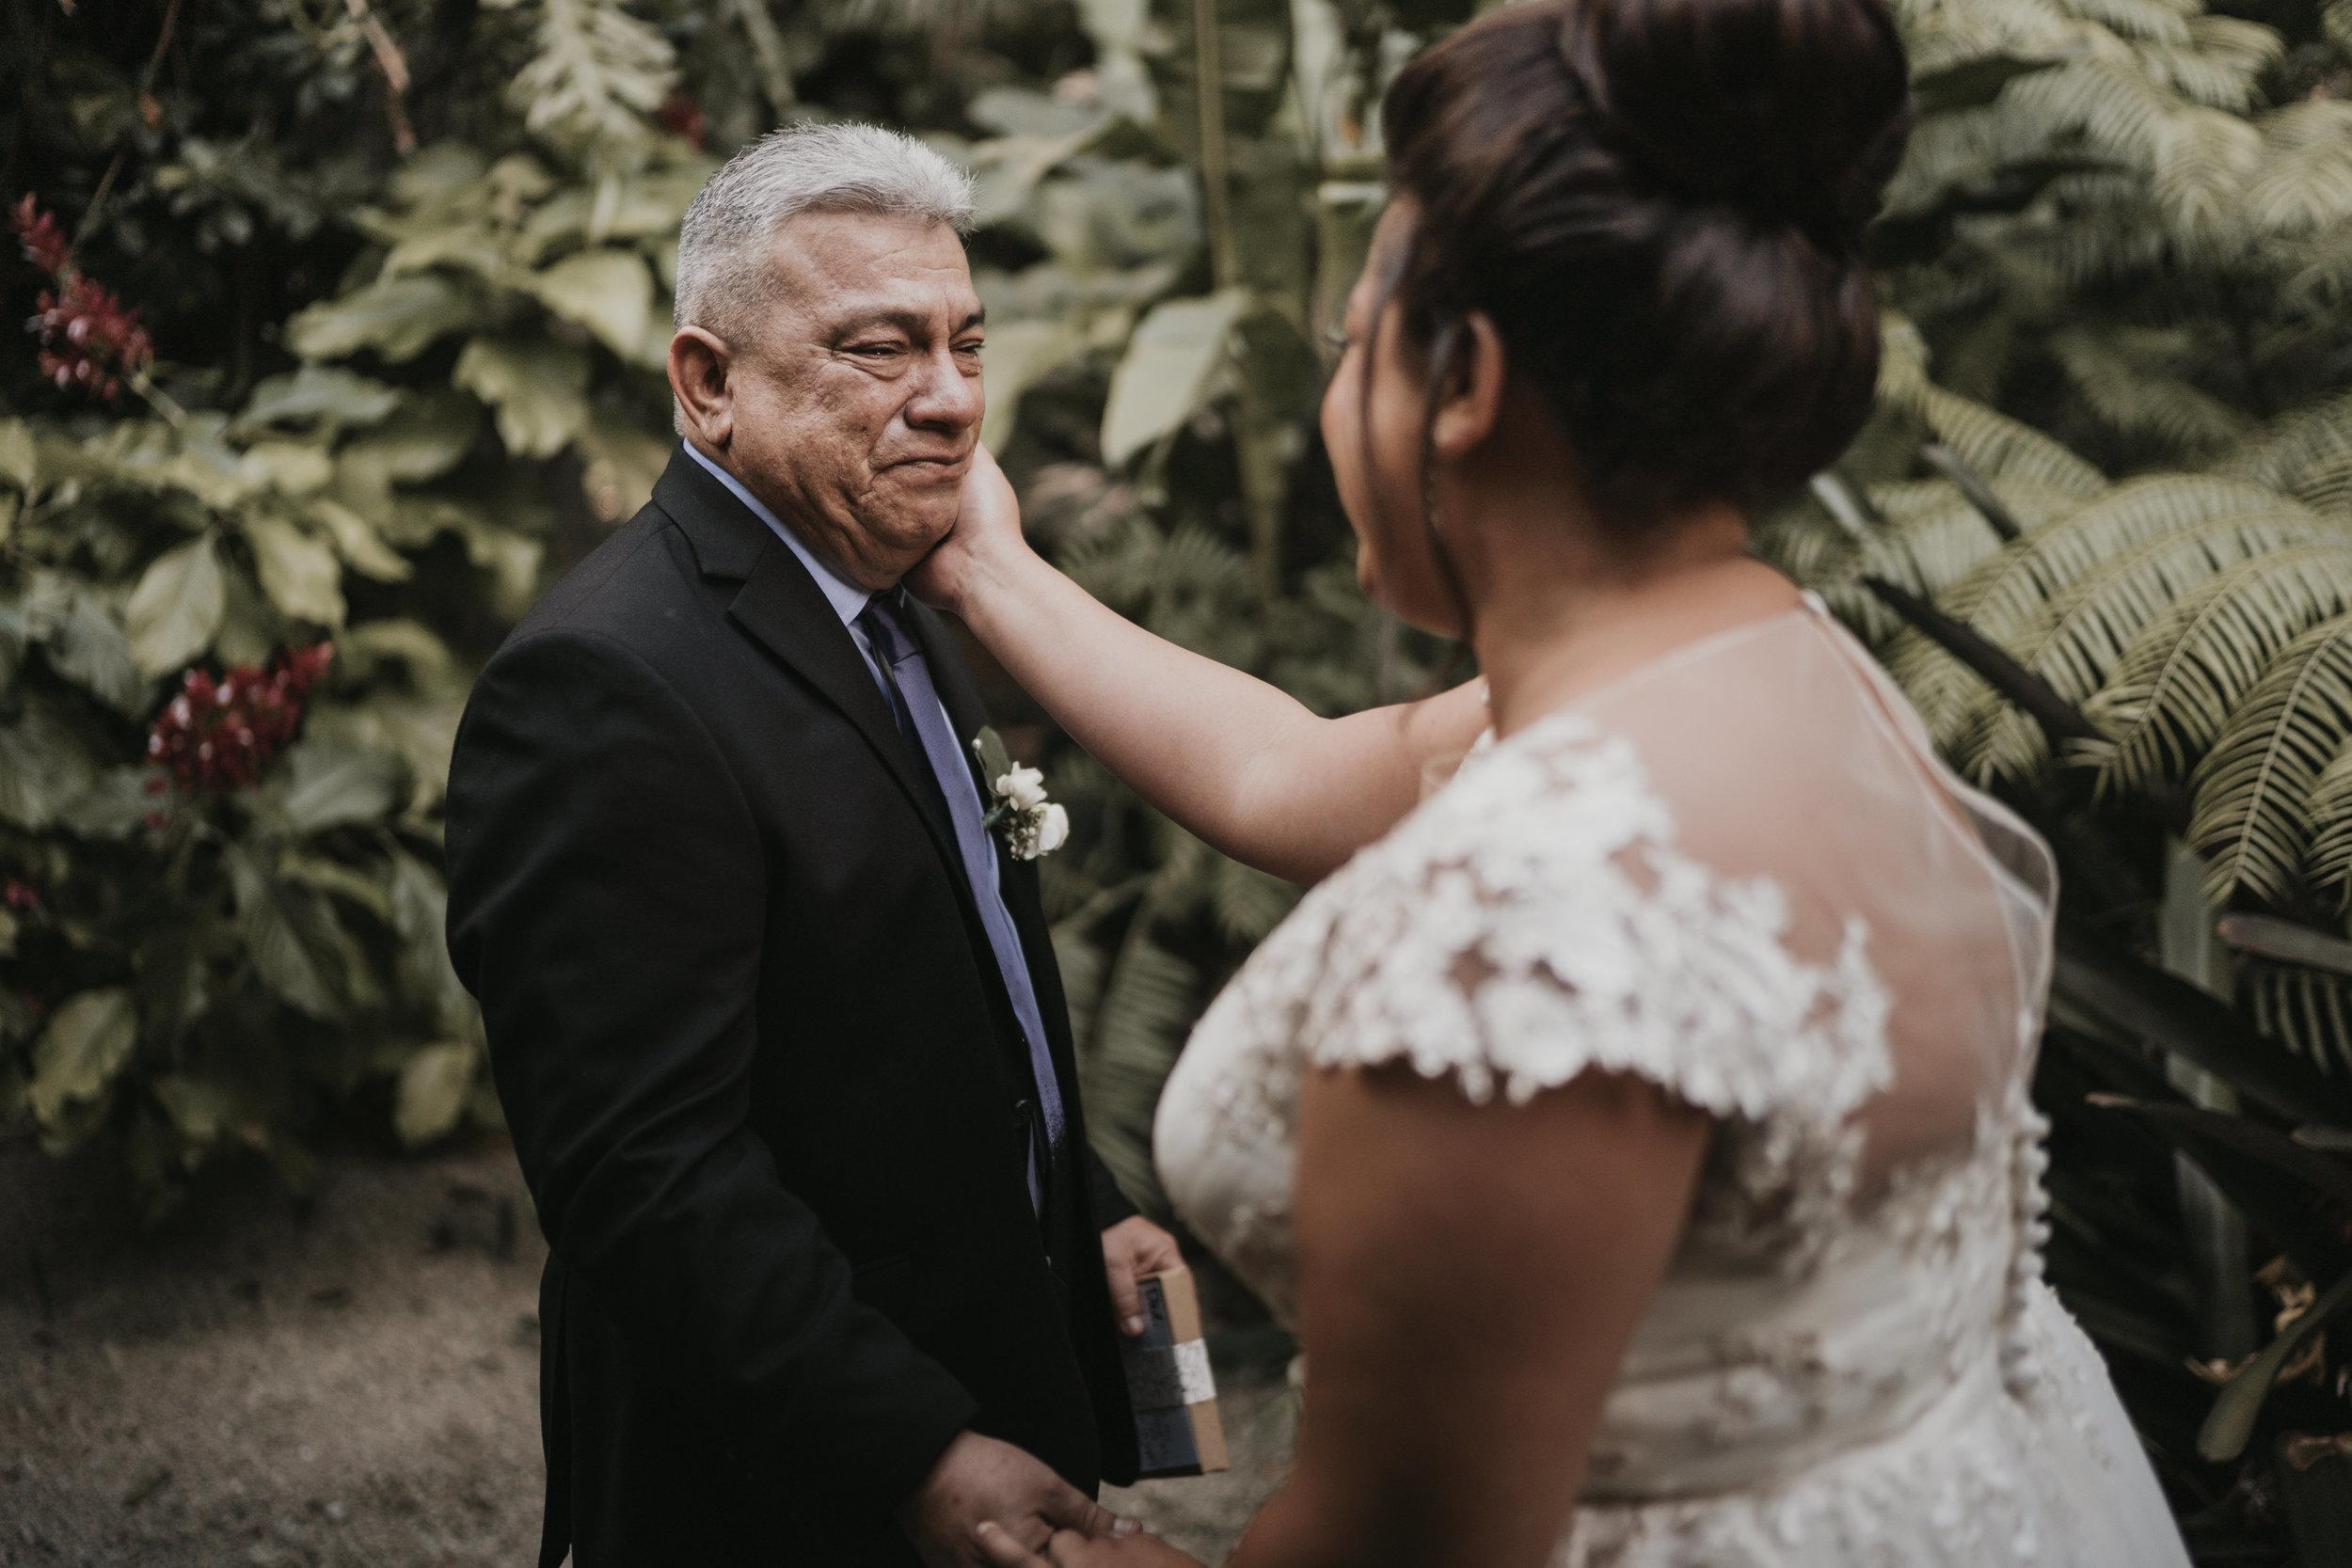 234MICHI&GABEWEDDINGDAY(WeddingFinal).jpg